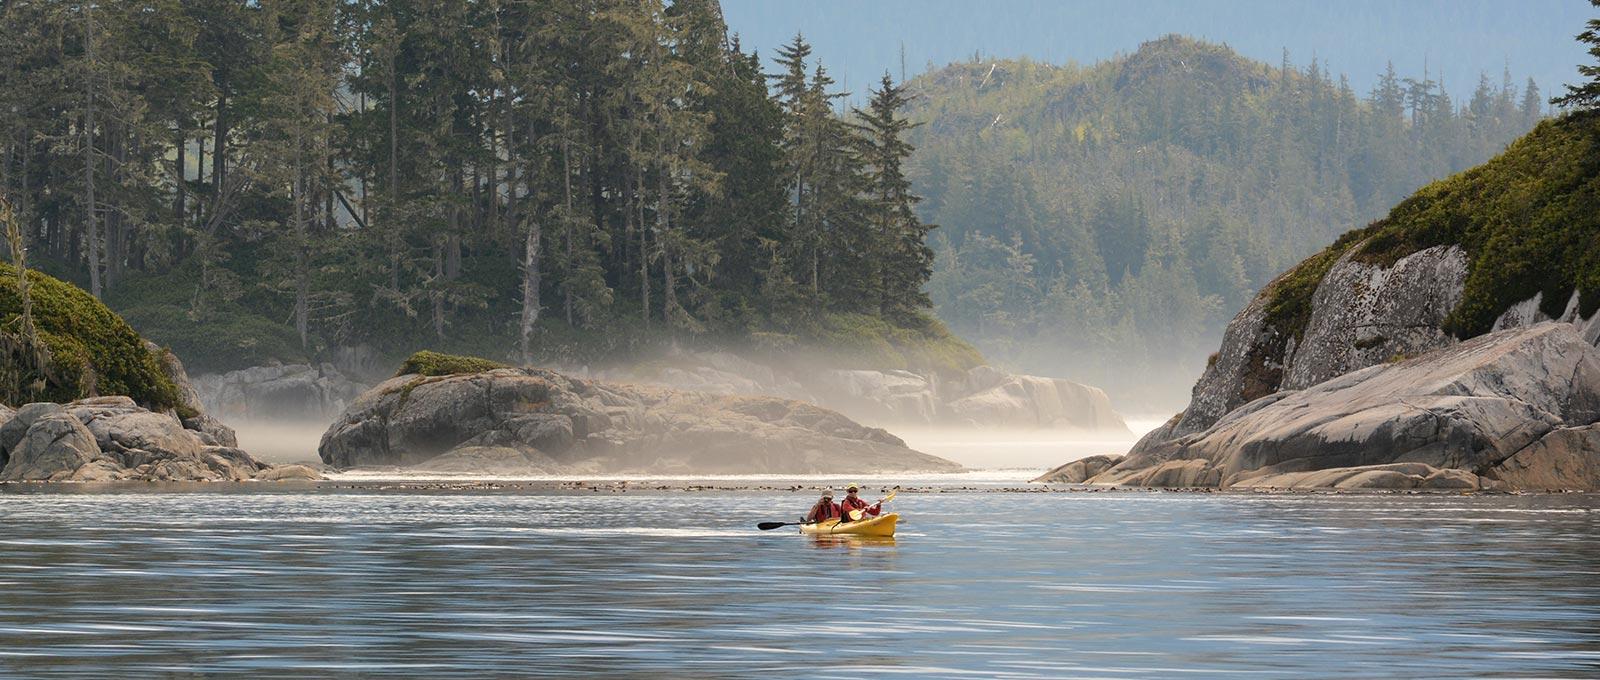 kayaking-vancouver-island